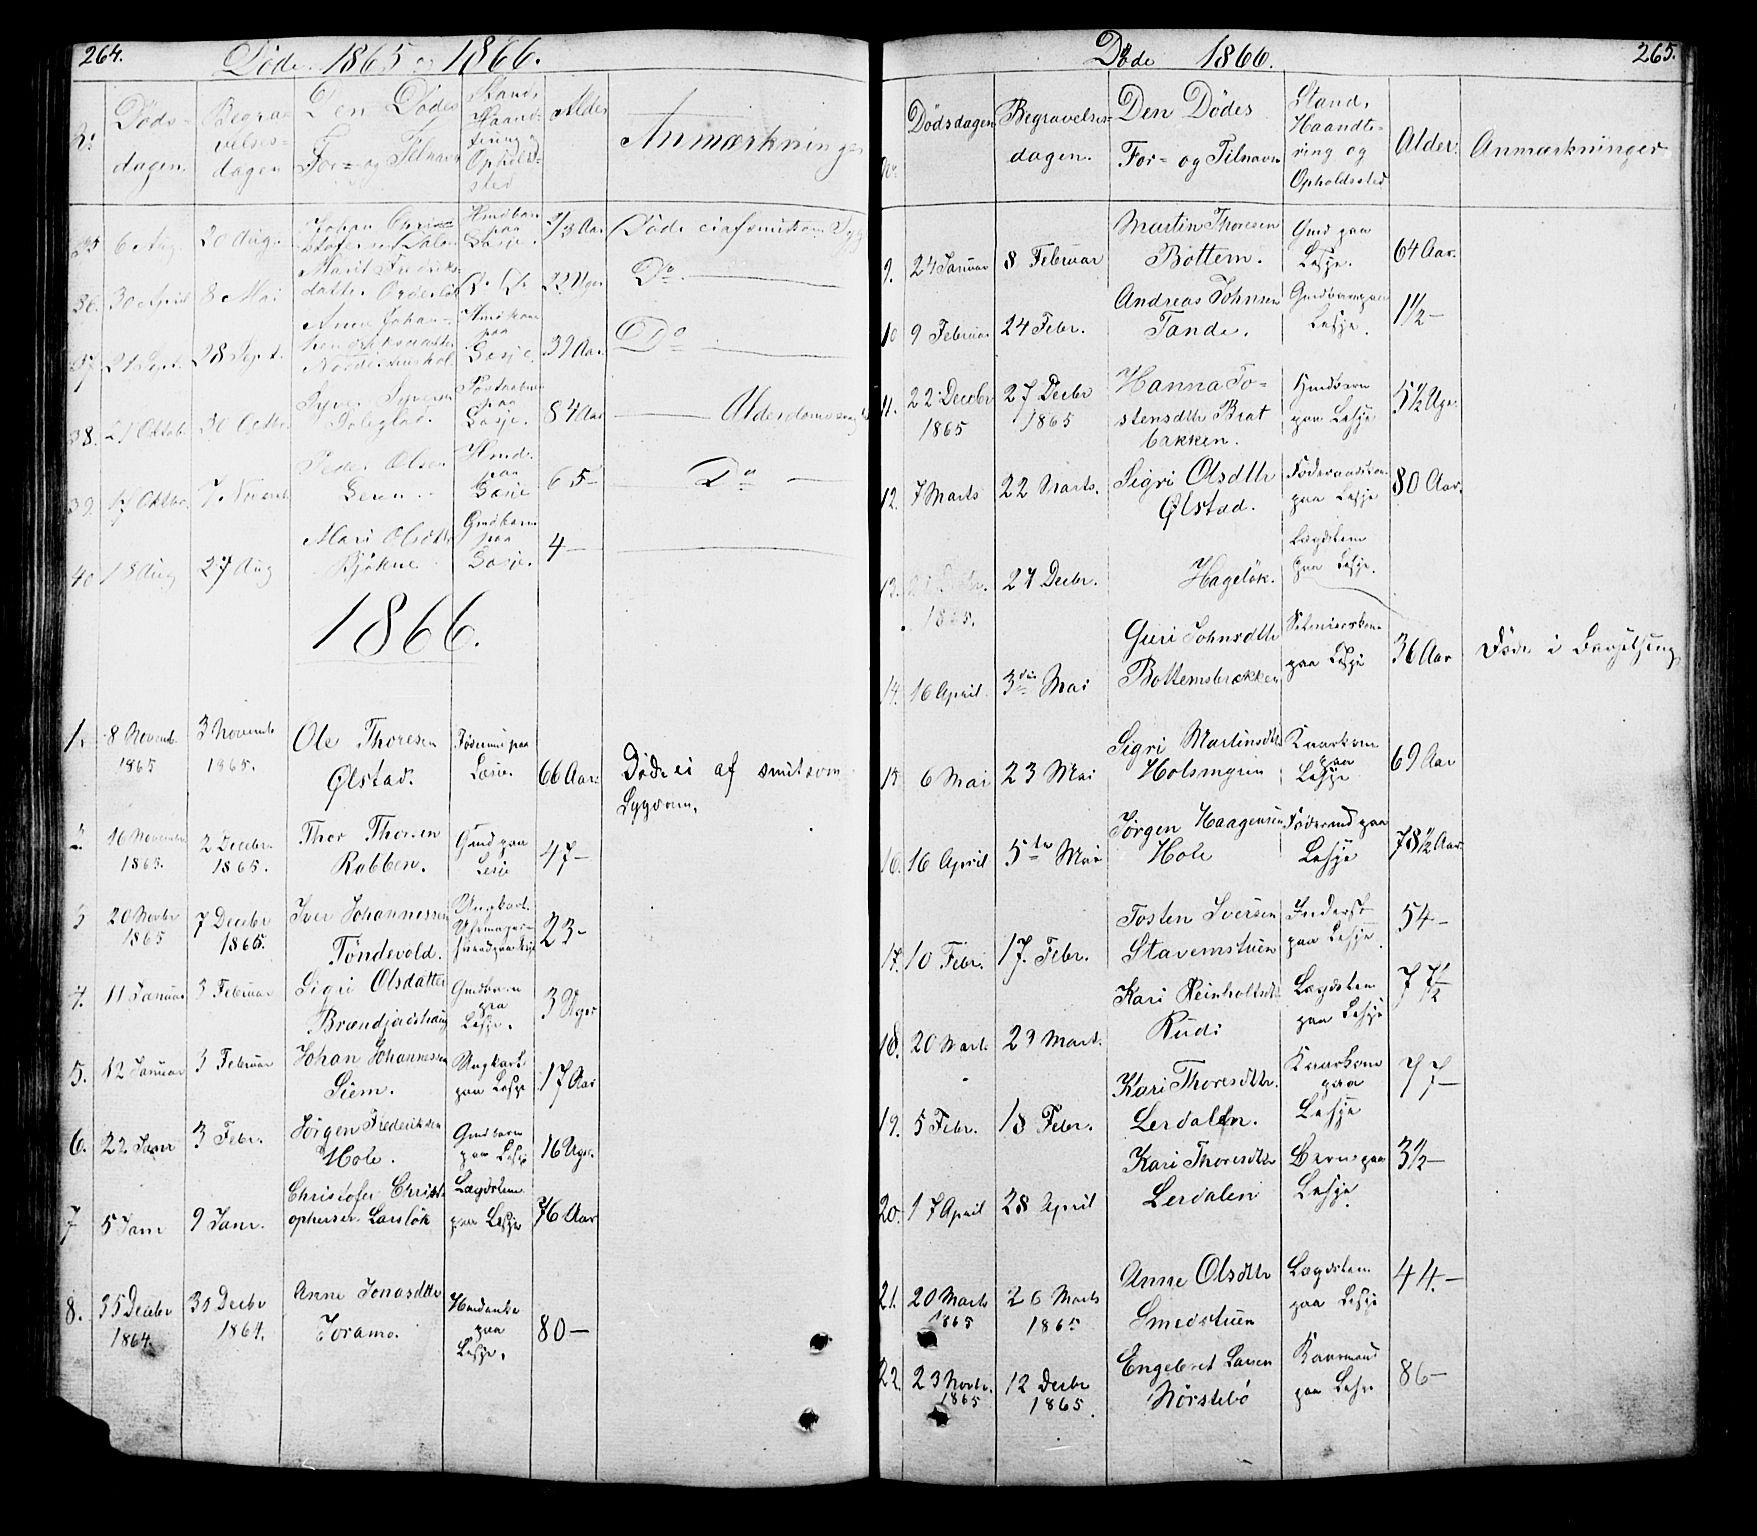 SAH, Lesja prestekontor, Klokkerbok nr. 5, 1850-1894, s. 264-265